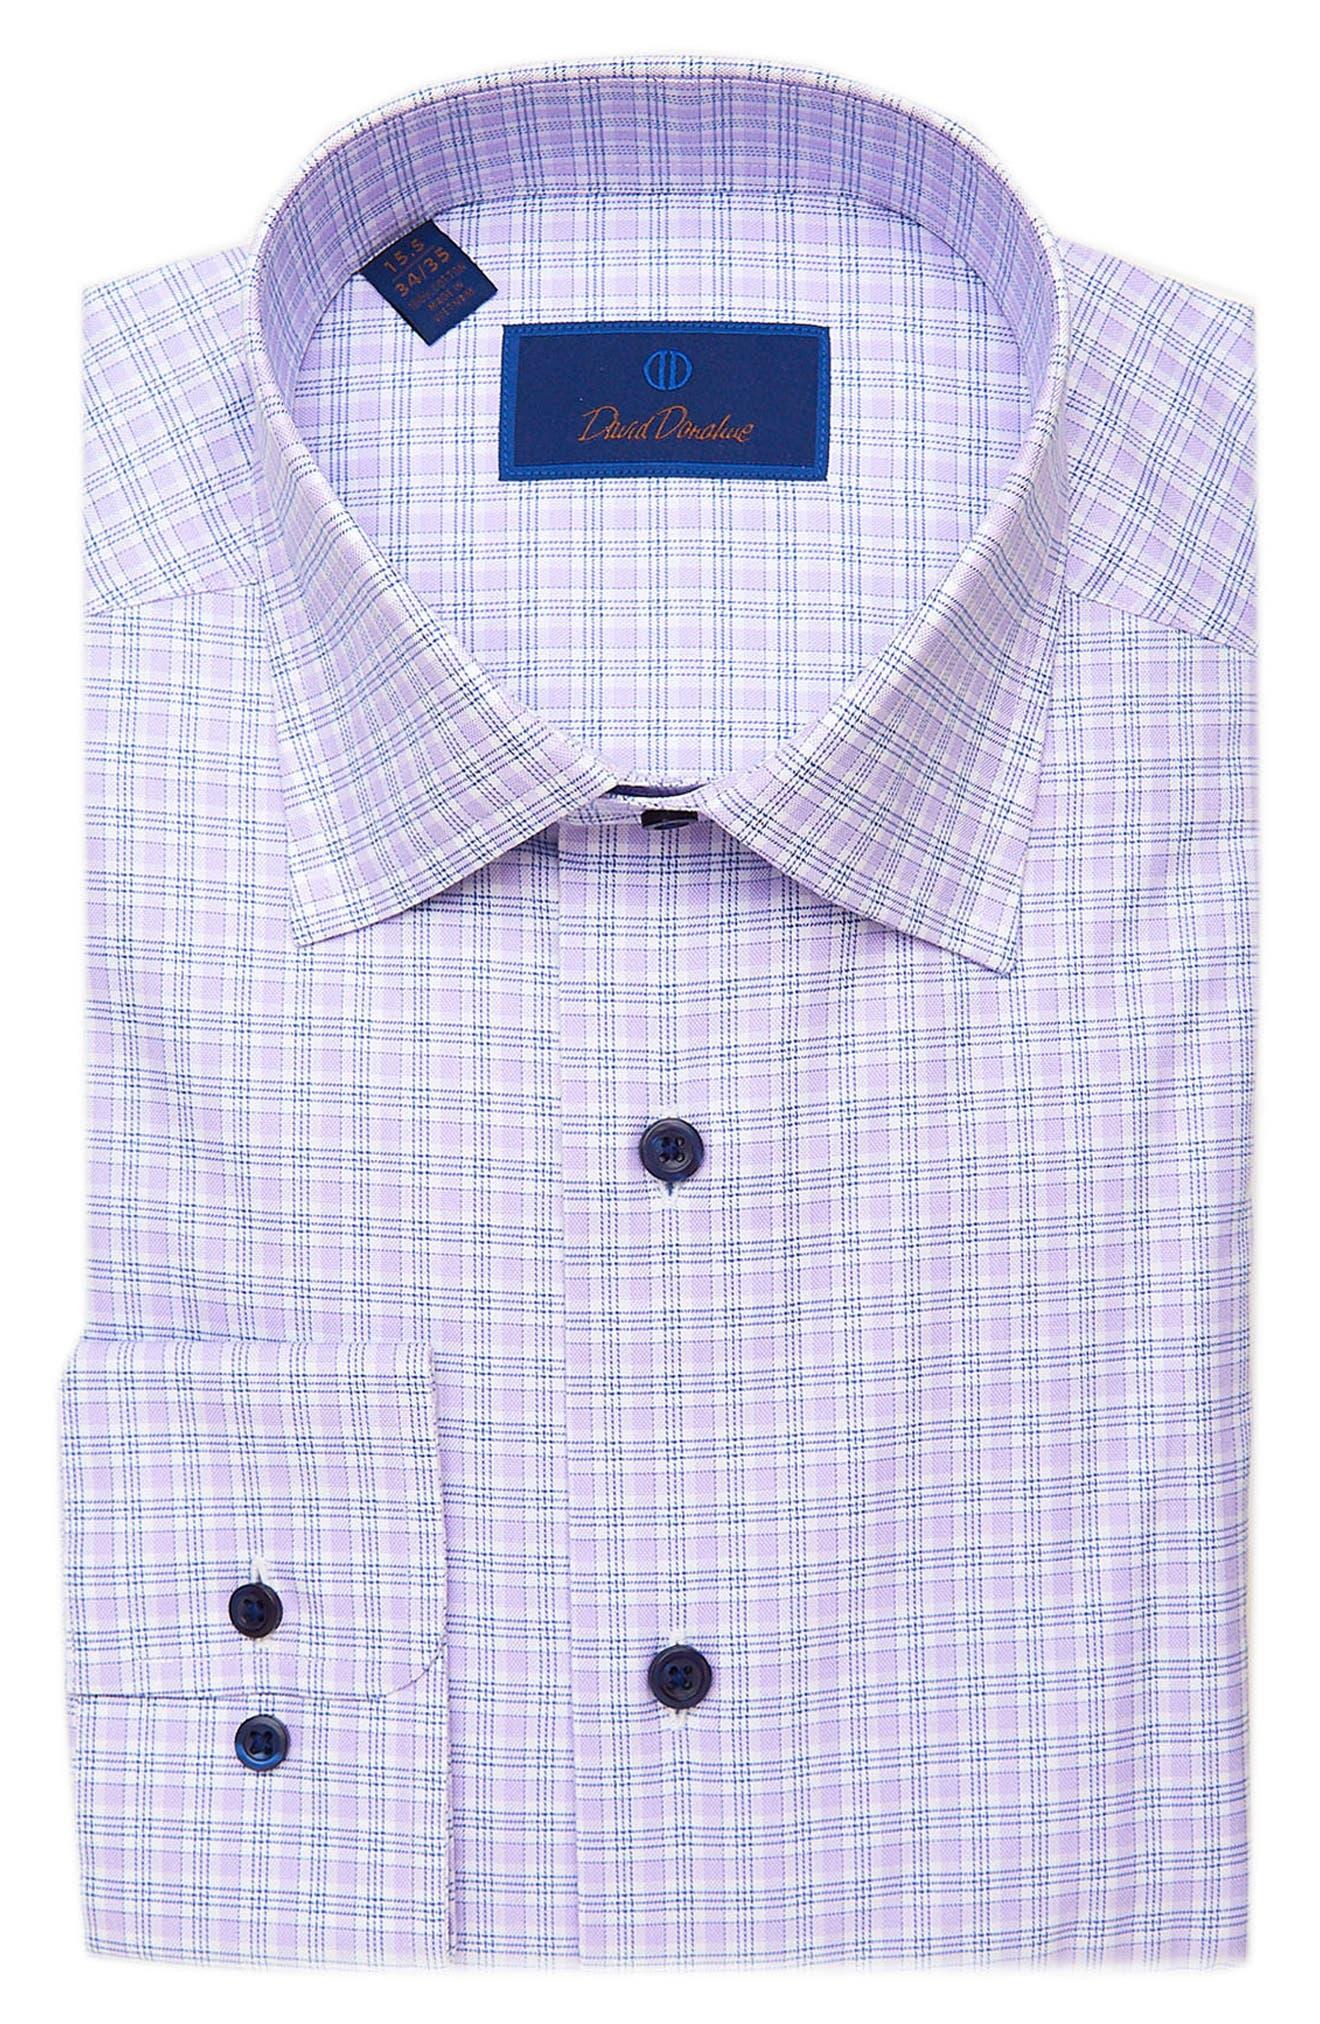 Men's Big & Tall David Donahue Regular Fit Plaid Dress Shirt